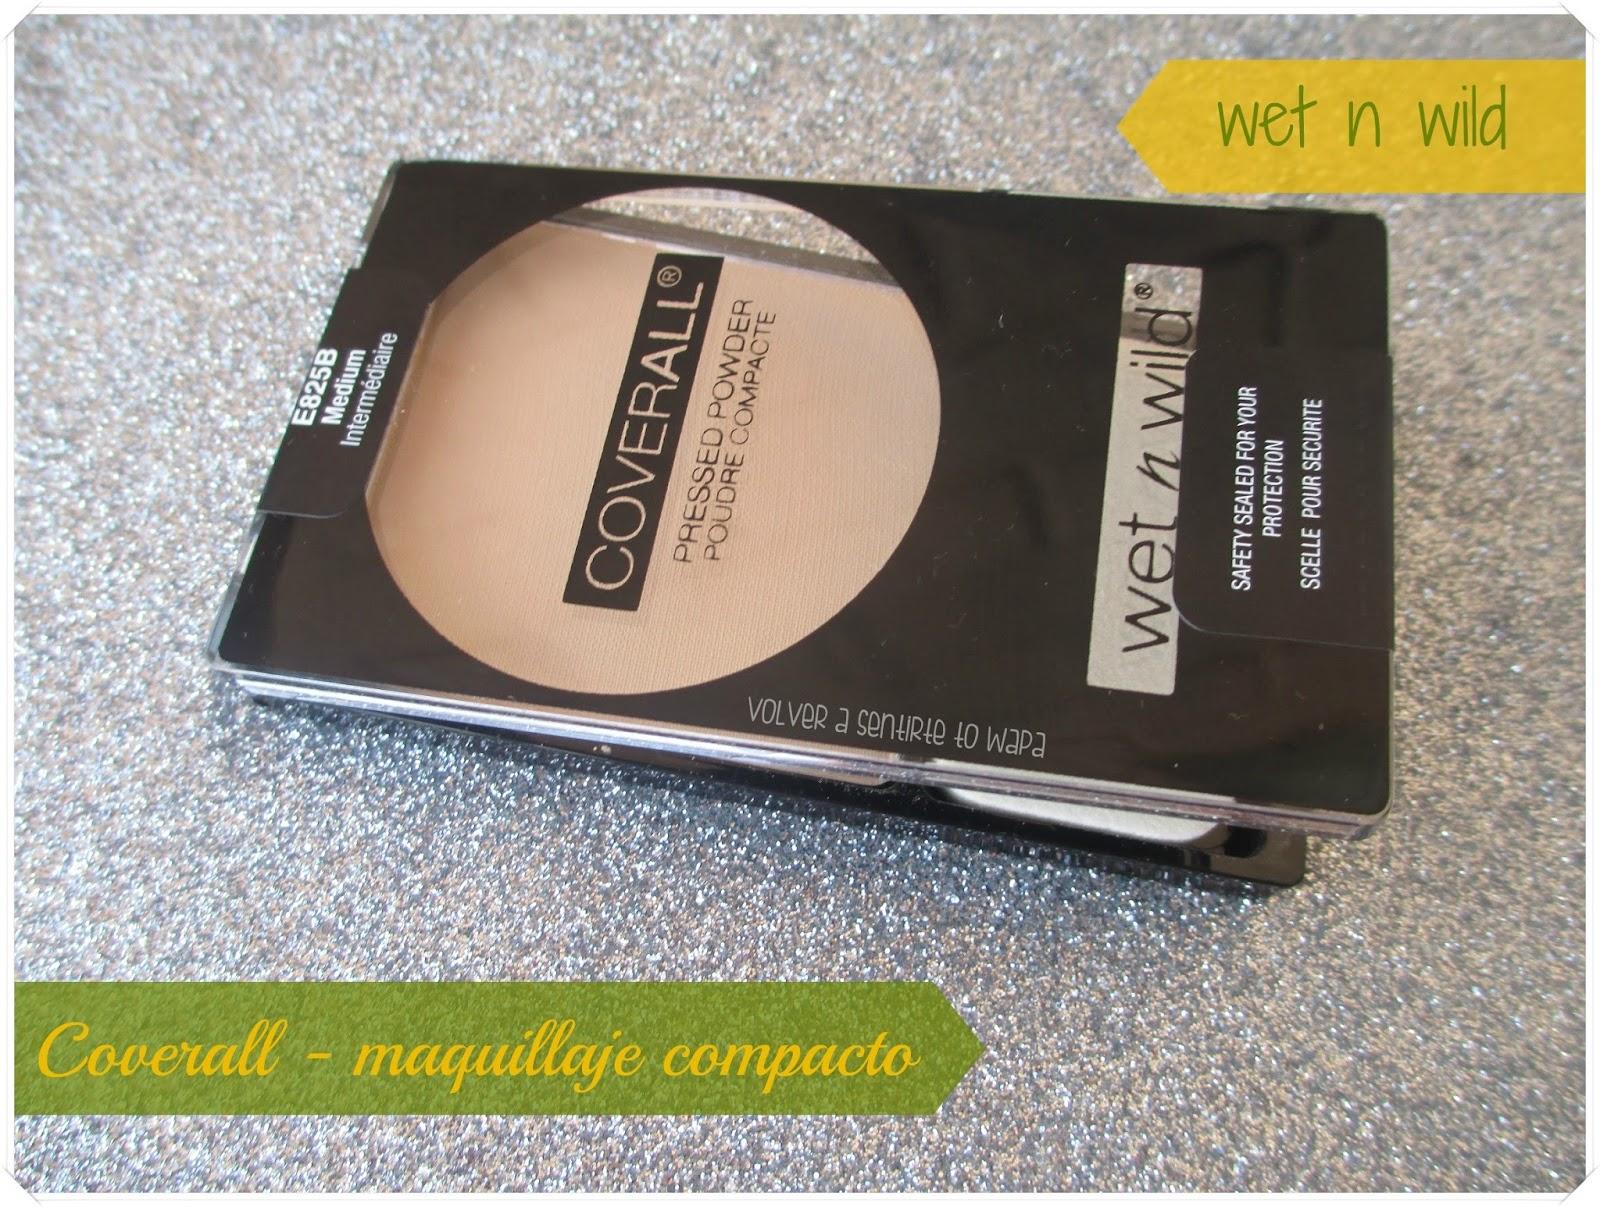 Coverall Pressed Powder, el maquillaje compacto de Wet n' Wild